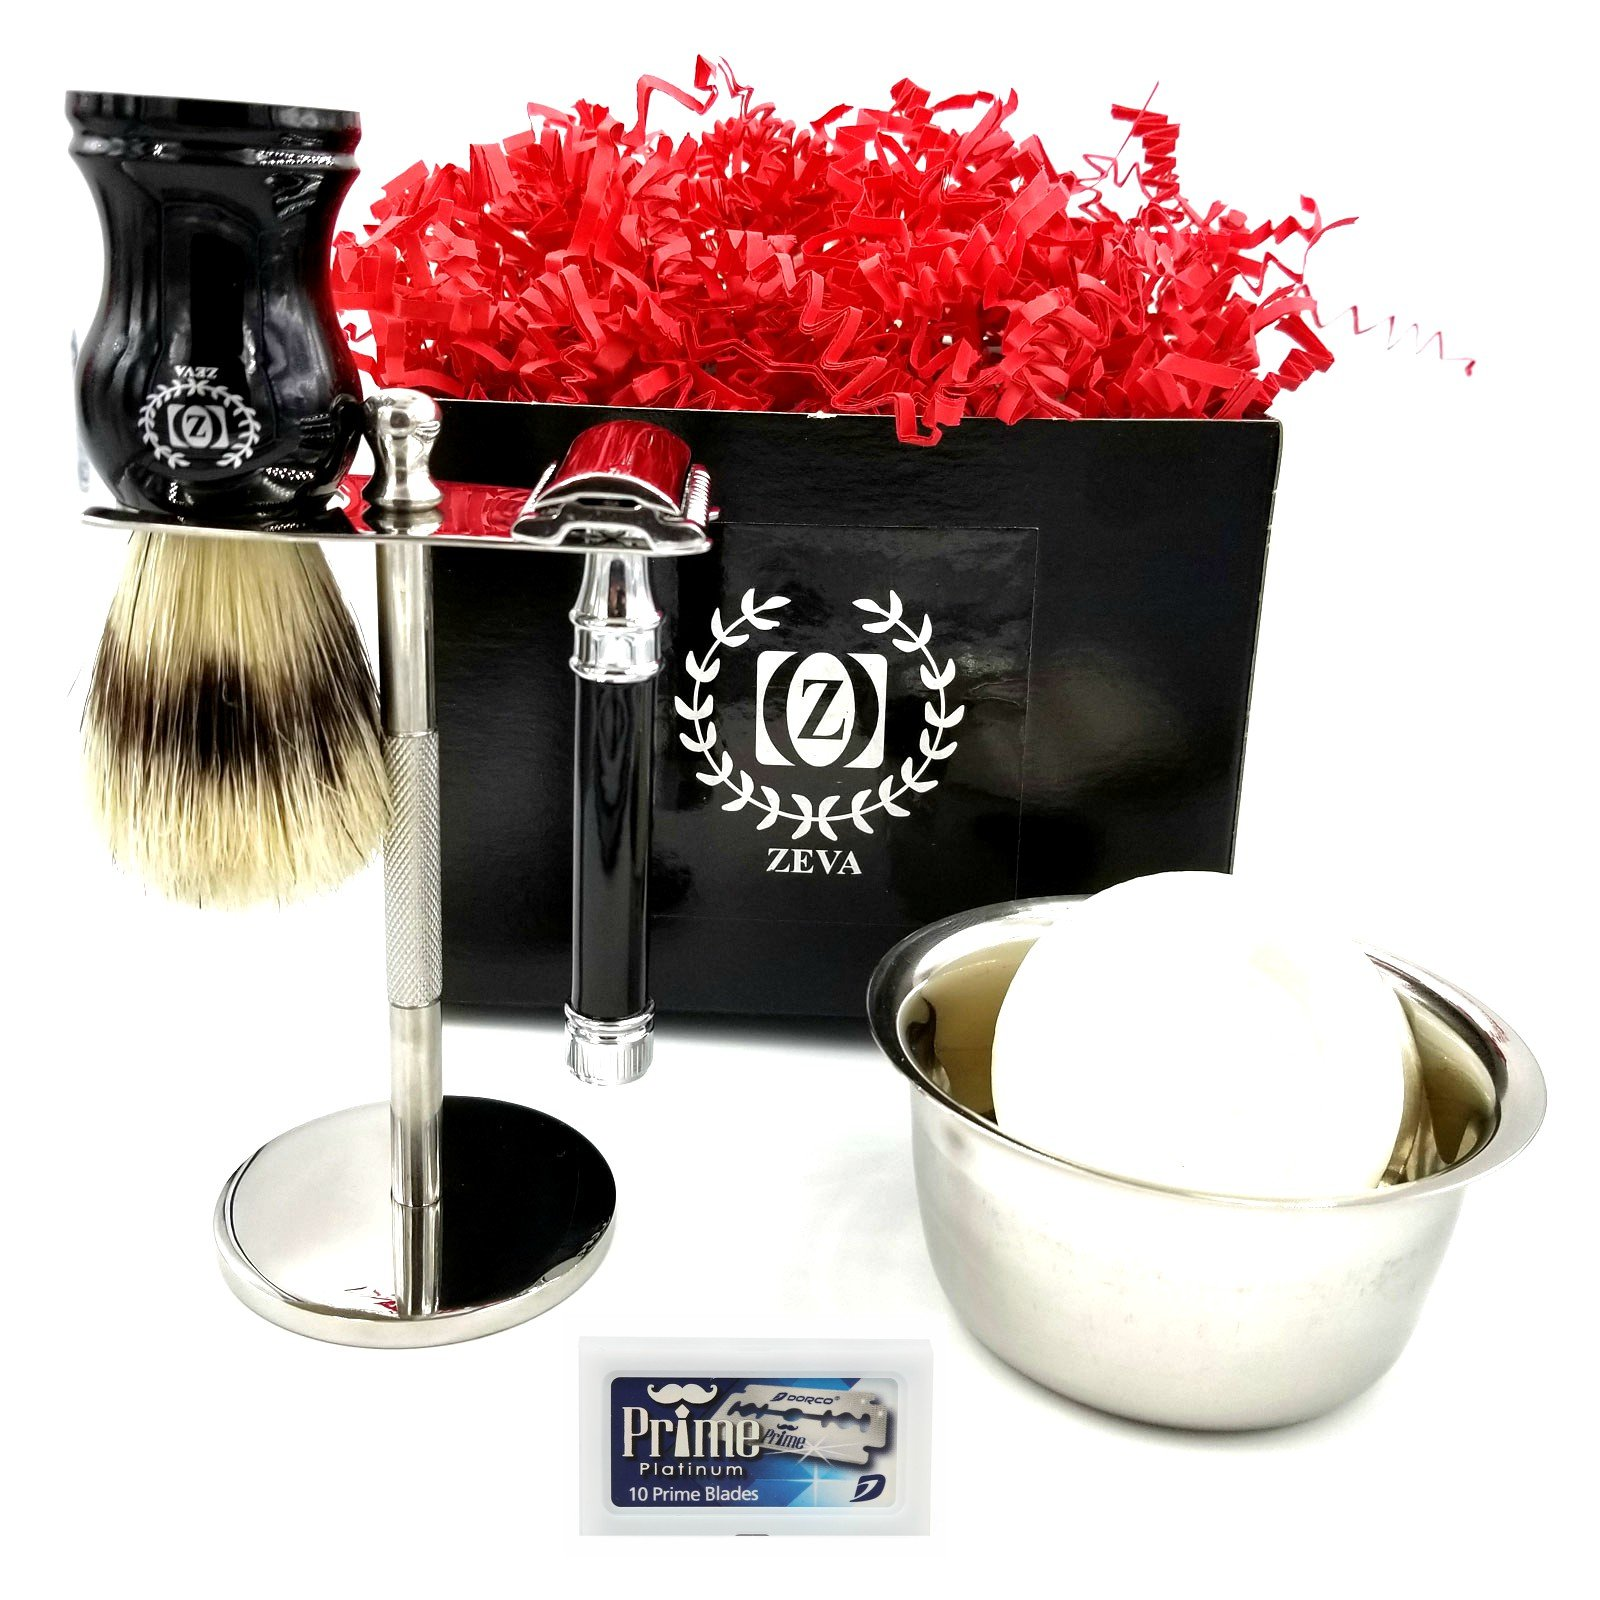 Mens Shaving Set Wooden Badger Hair Brush Safety Razor Classic Shave Vintage Holiday Season Gift Idea